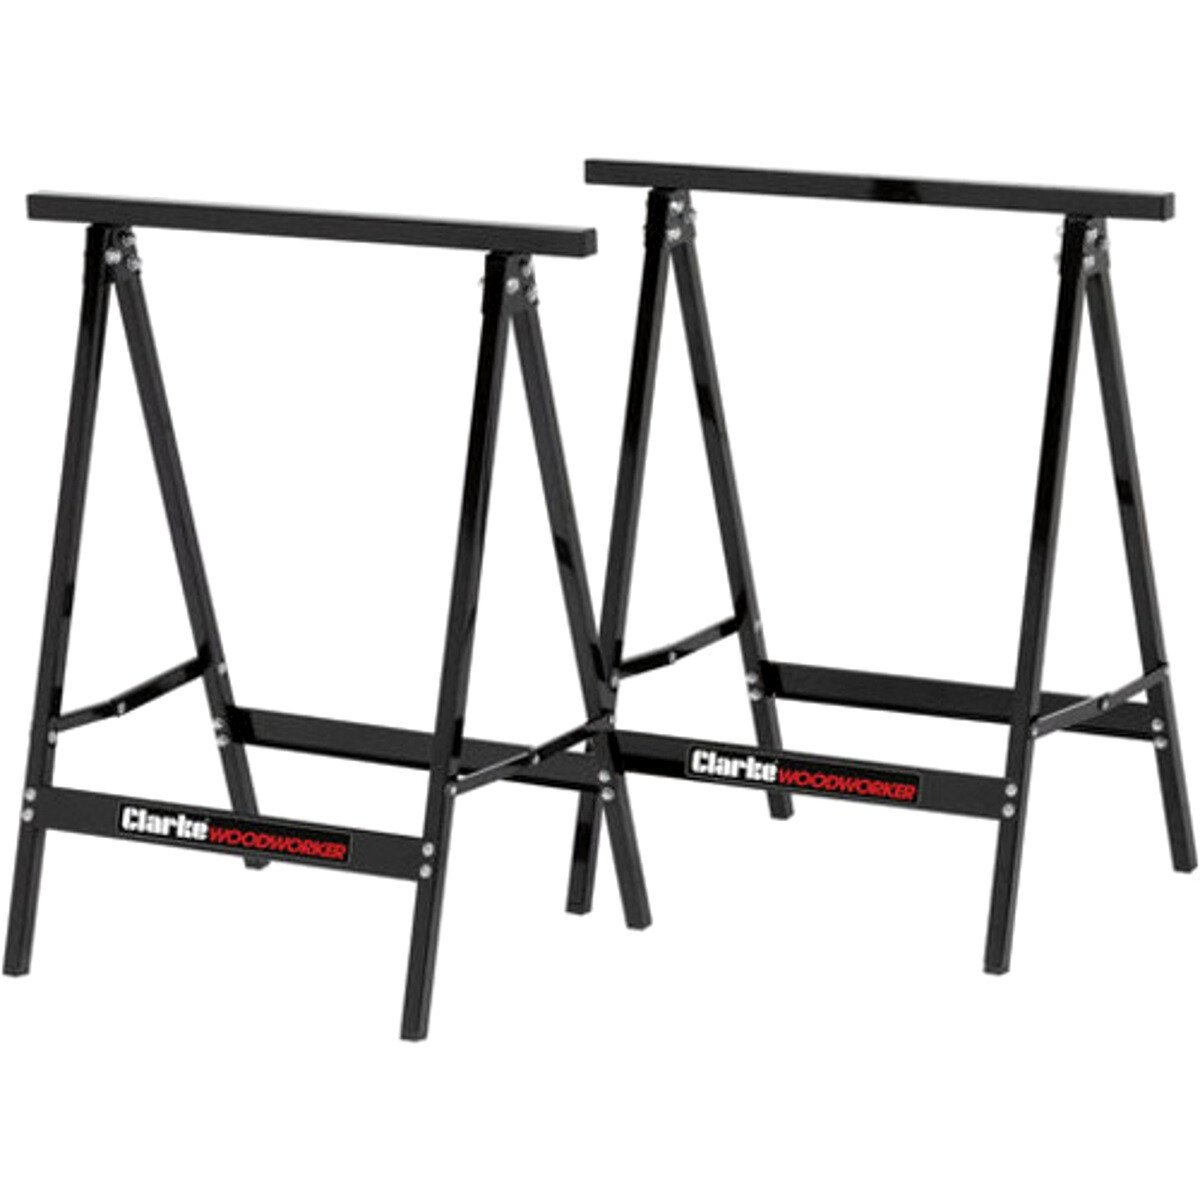 Clarke CT100PR Folding Work Stand (Pair) 6600015